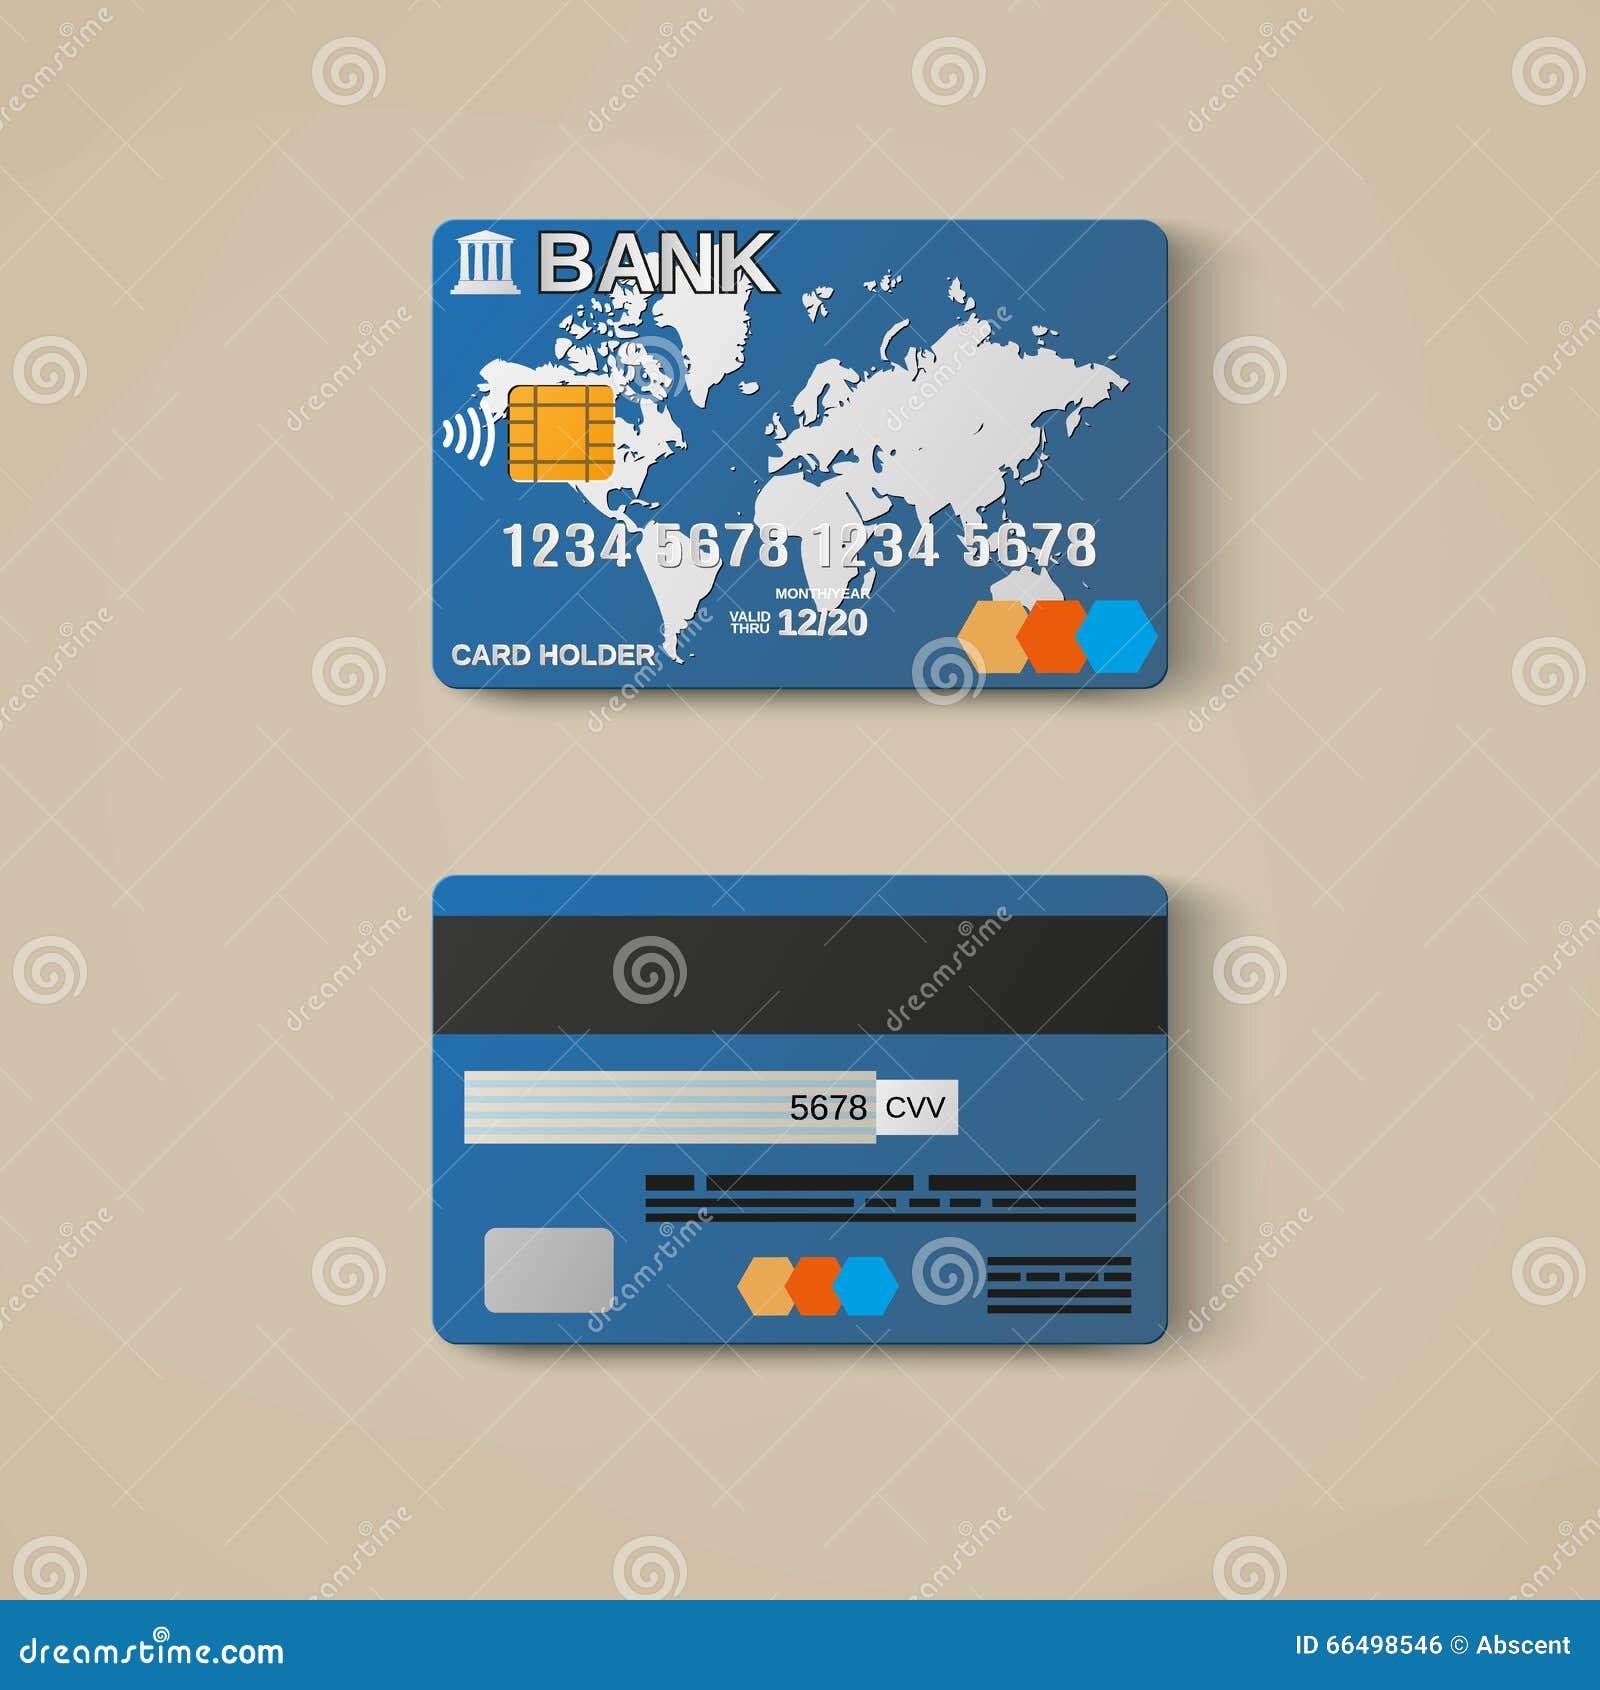 Tarjeta De Banco, Plantilla Del Diseño De La Tarjeta De Crédito ...